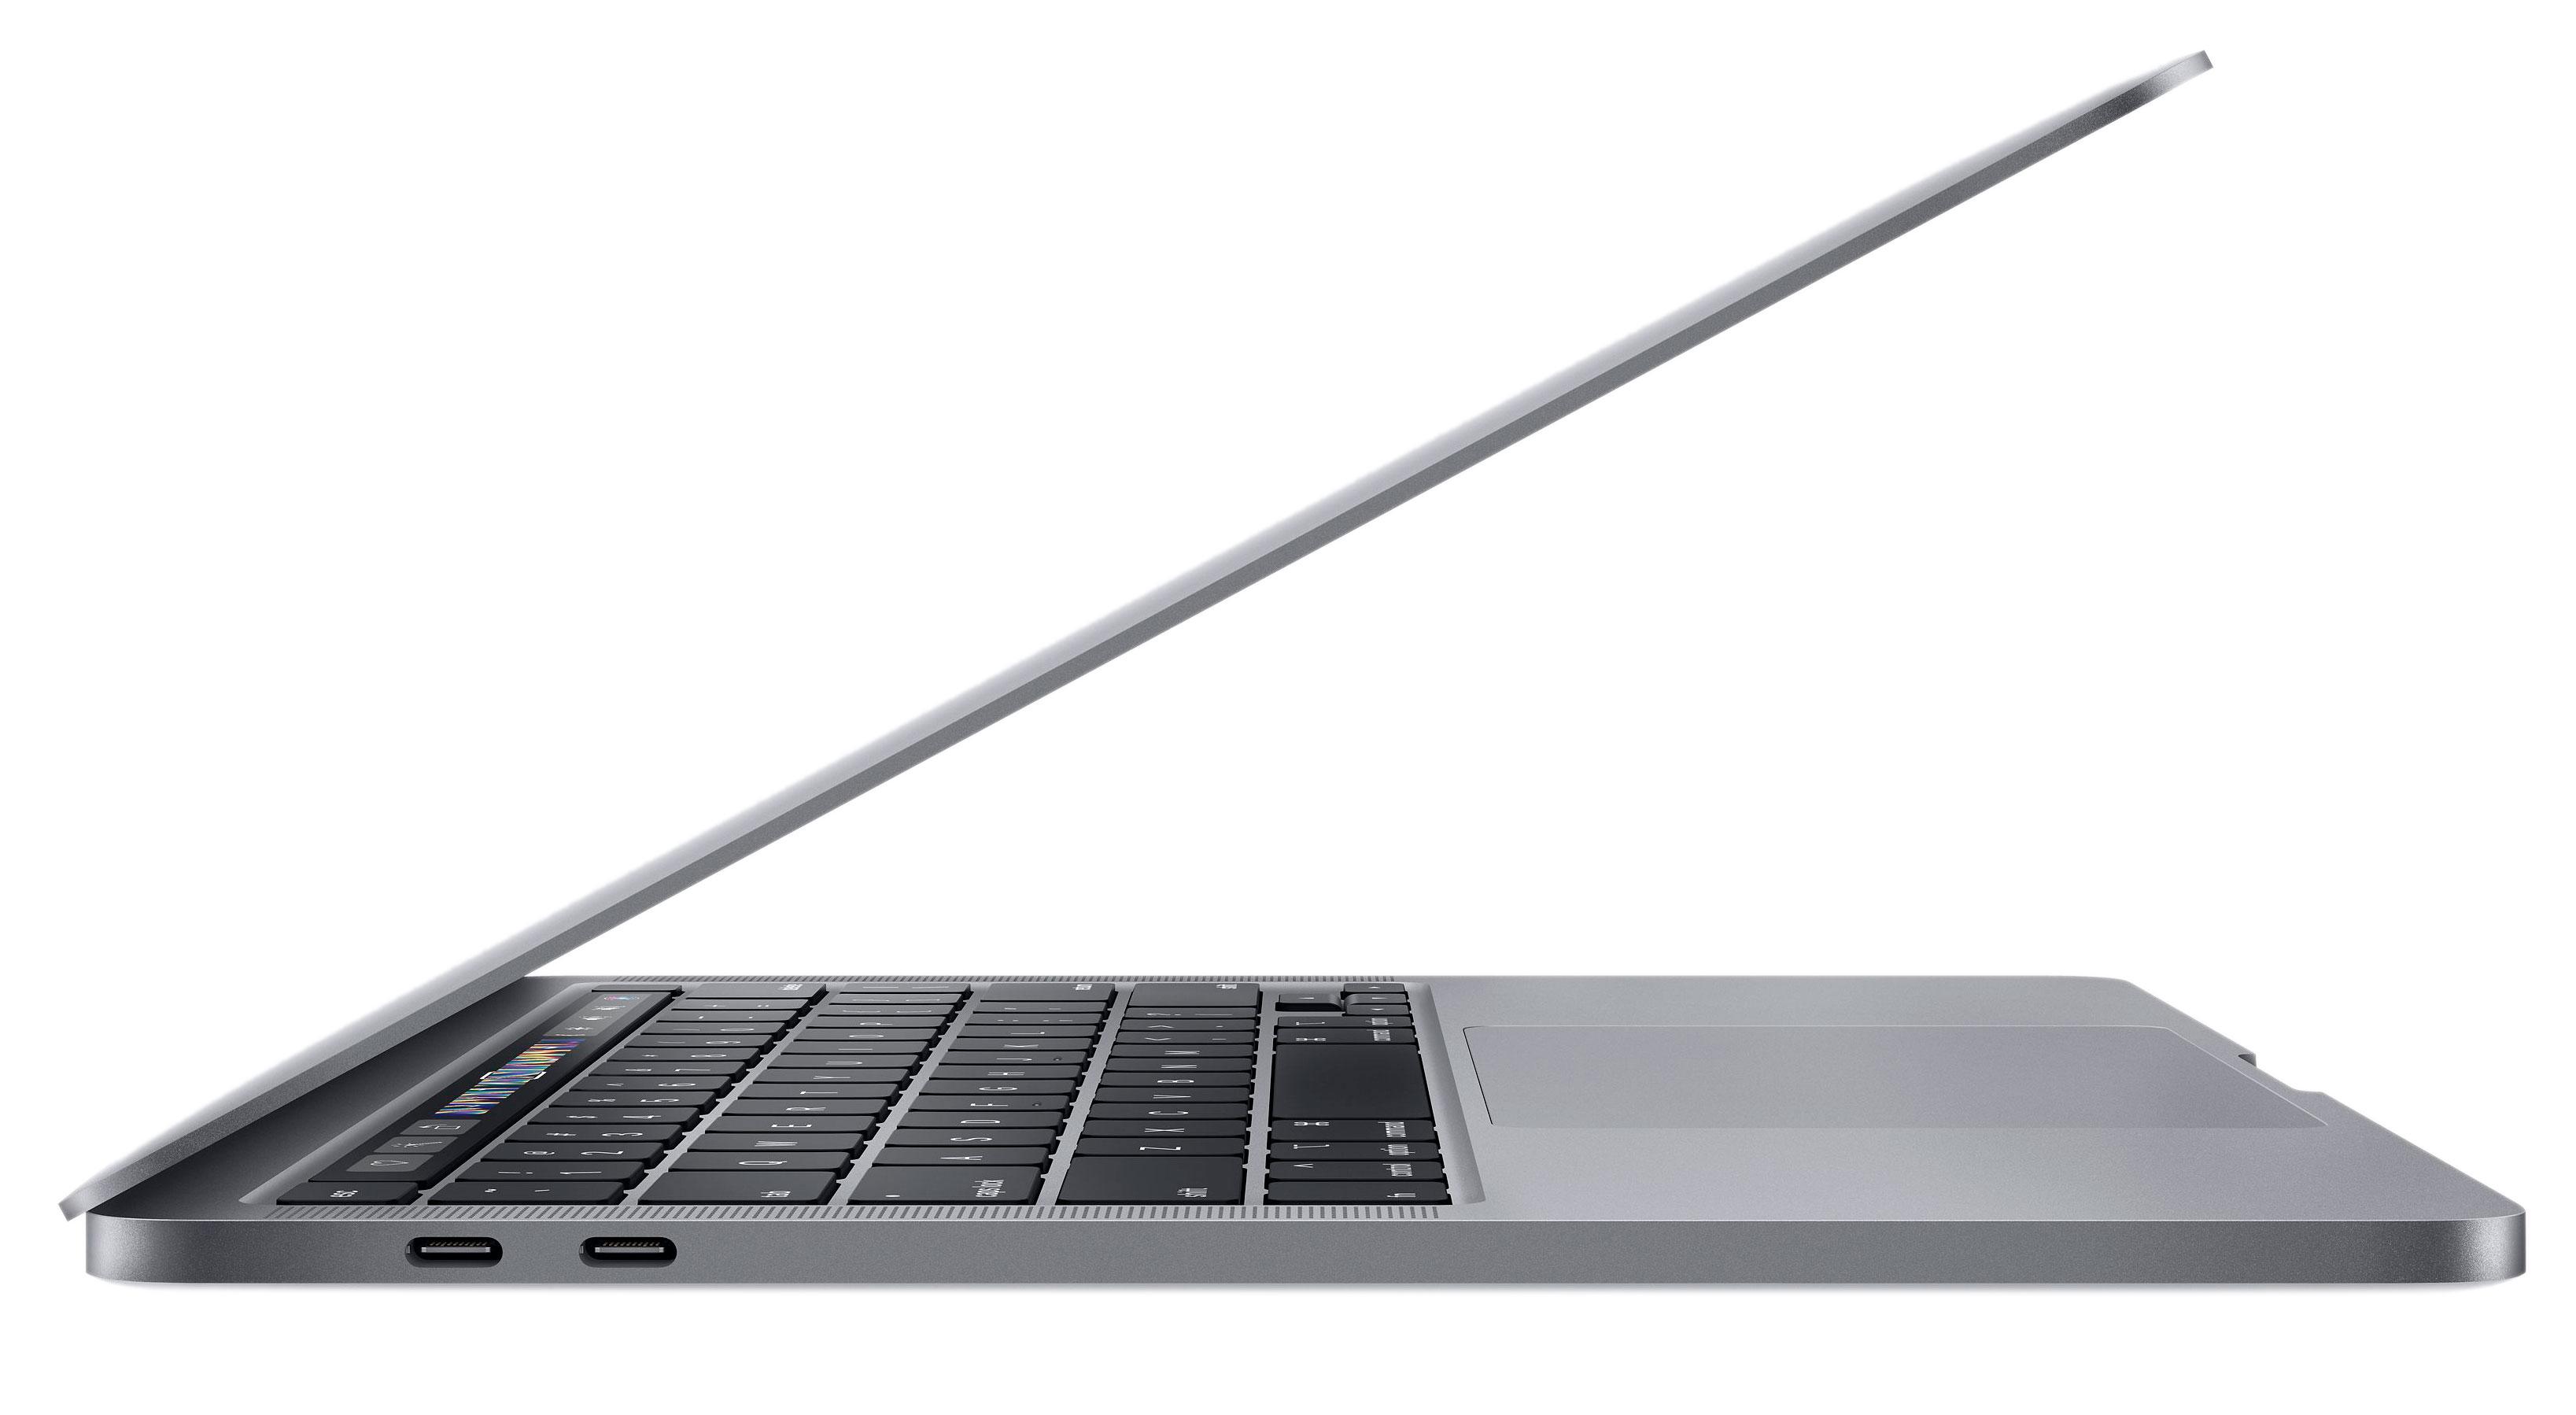 13‑inch MacBook Pro (2020) - Spacegrijs - Intel 2,0‑GHz quad‑coreprocessor - 16 GB RAM - 1 TB SSD - Vier (USB‑C) Thund...